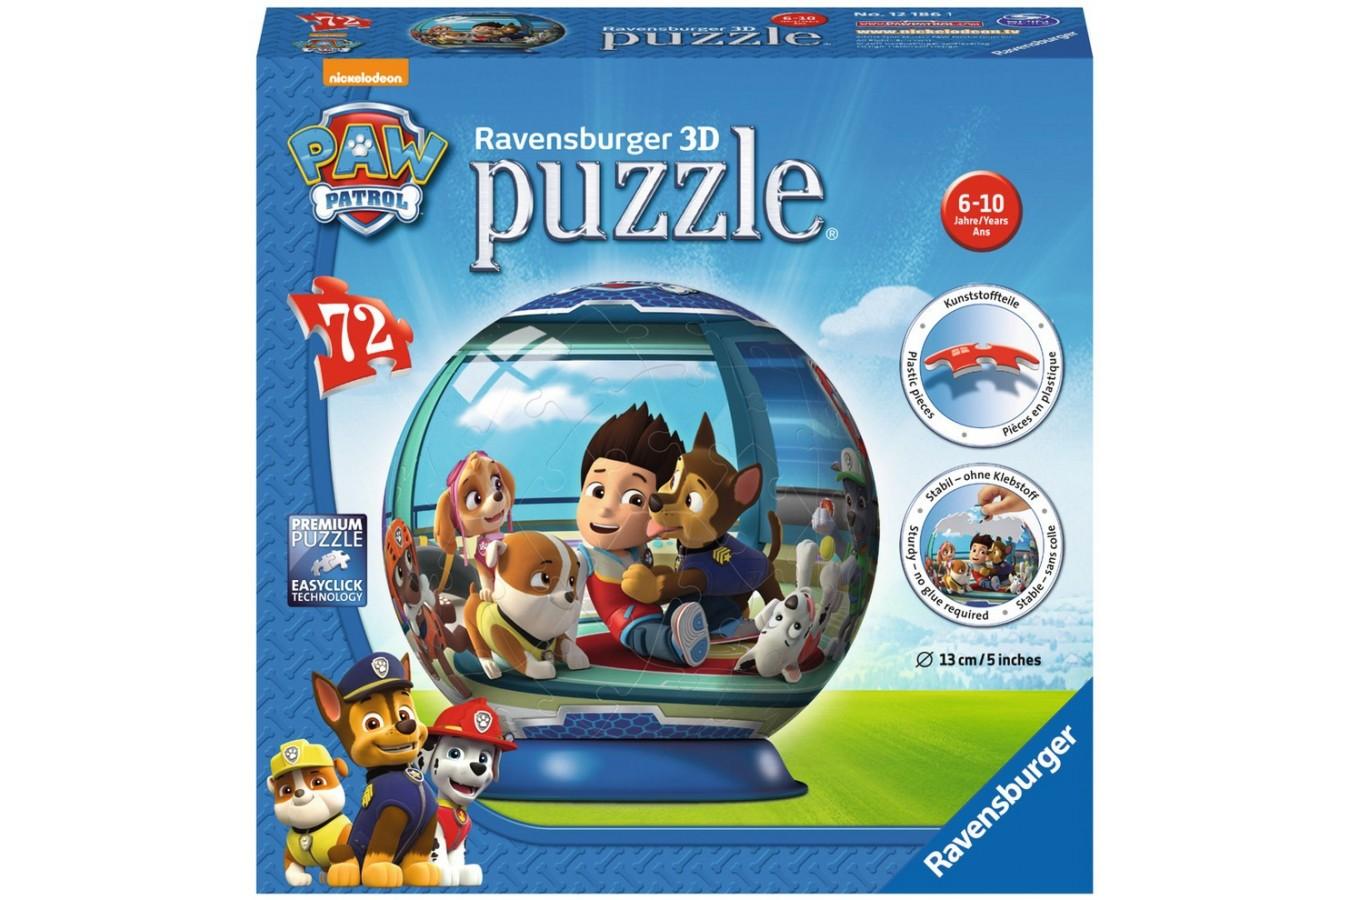 Puzzle glob Ravensburger - Paw Patrol, 72 piese (12186)